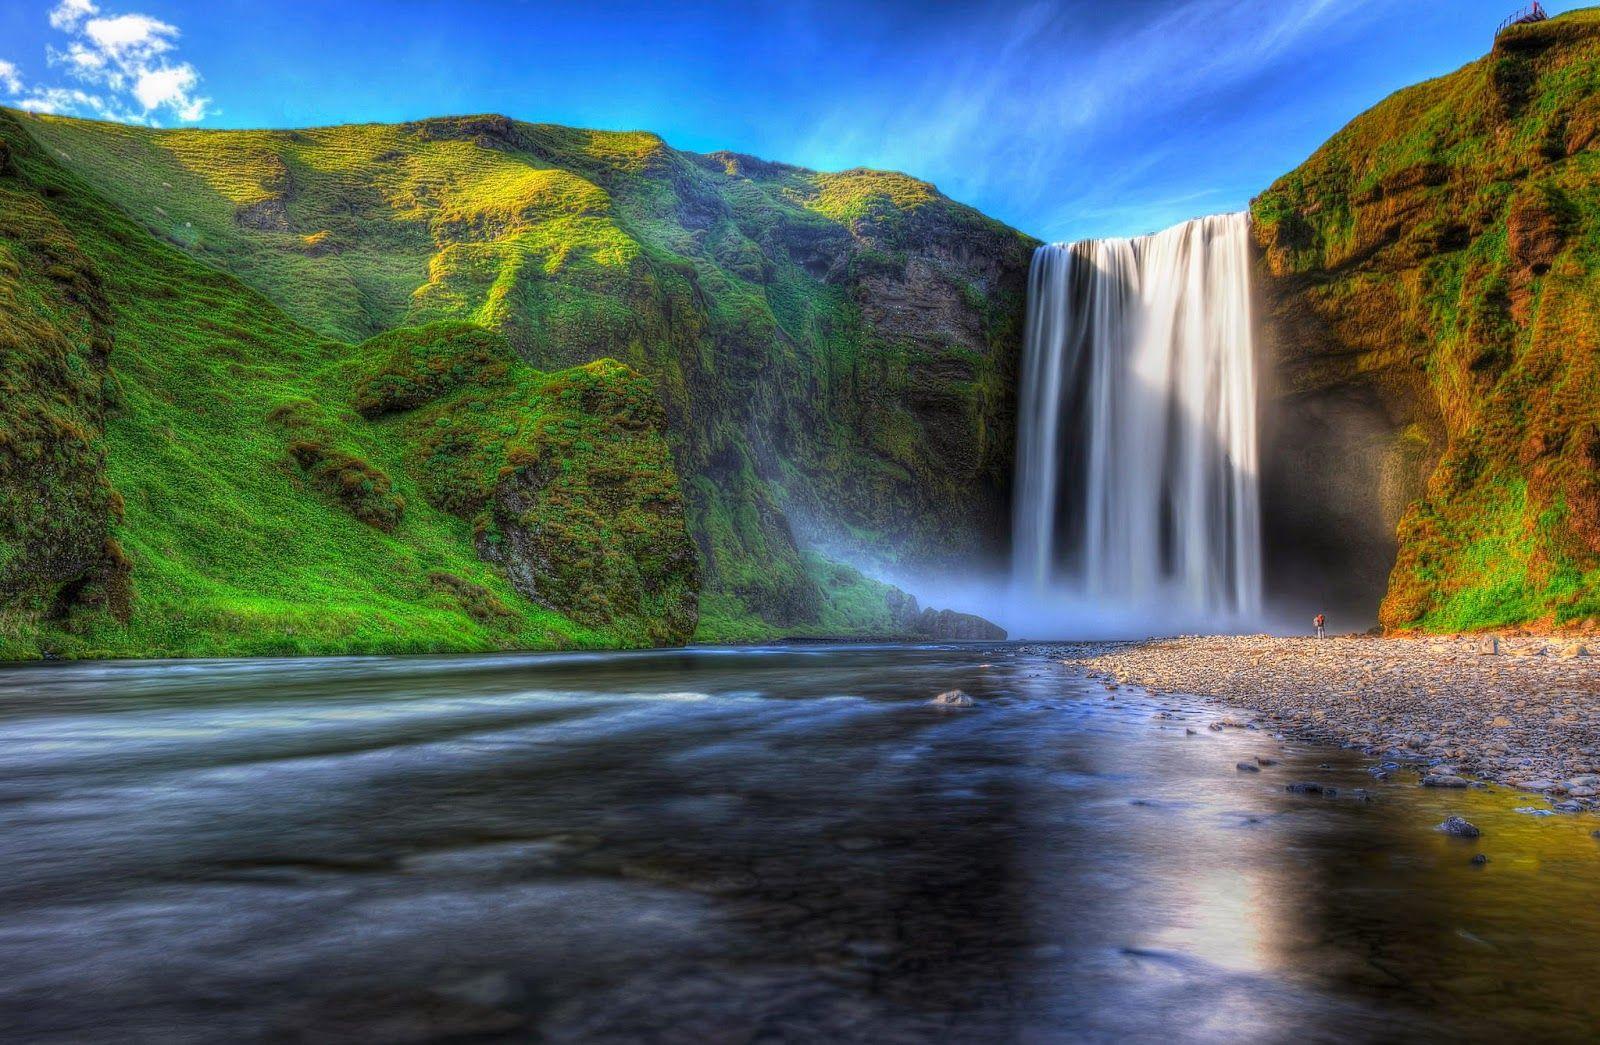 33 fotograf as de cascadas con hermosos paisajes naturales - Paisajes de jardines ...